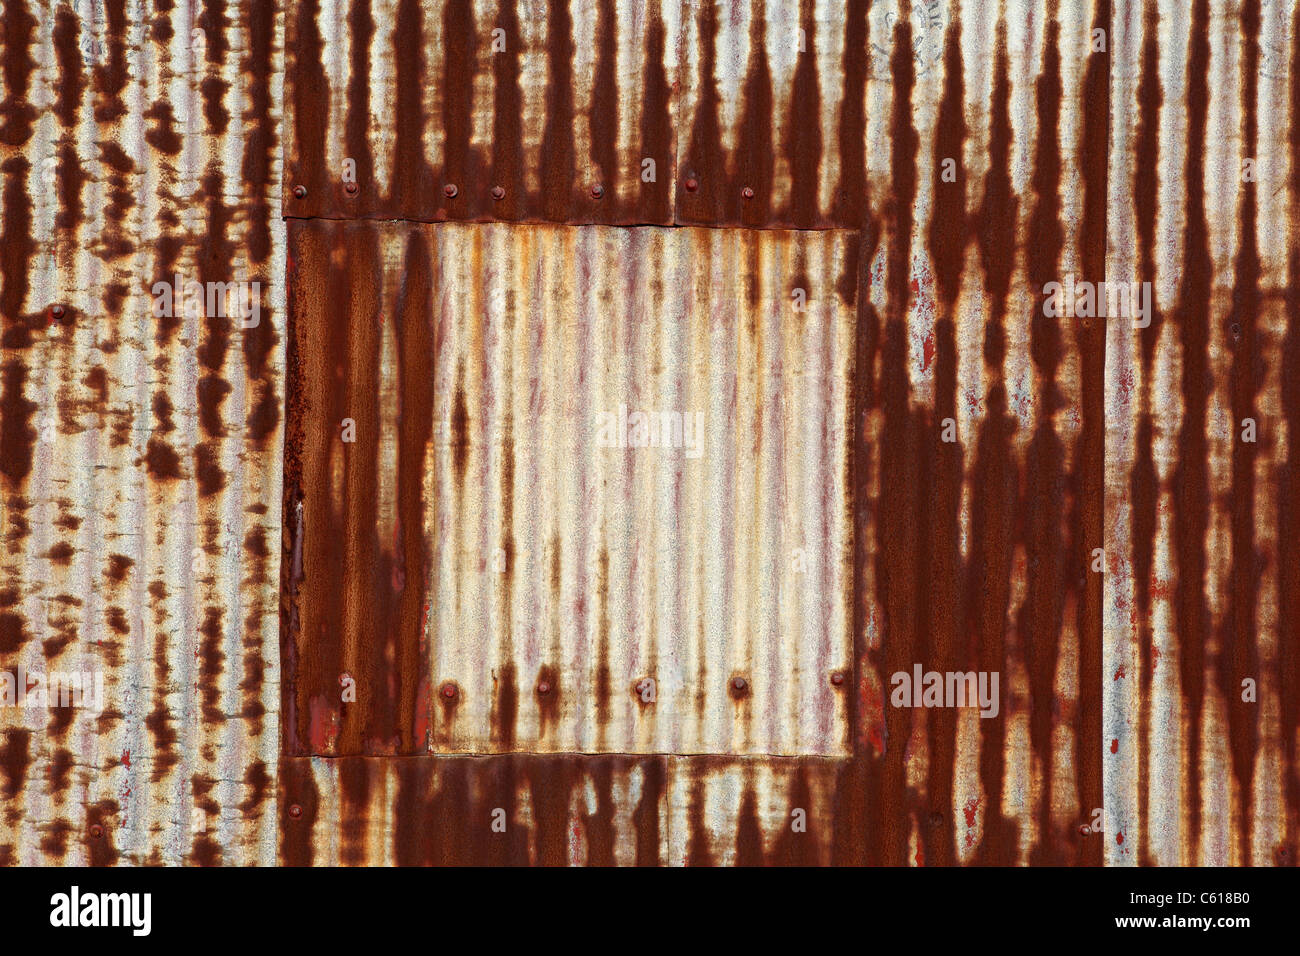 Rusty corrugated iron shed wall. New Zealand, Australasia - Stock Image